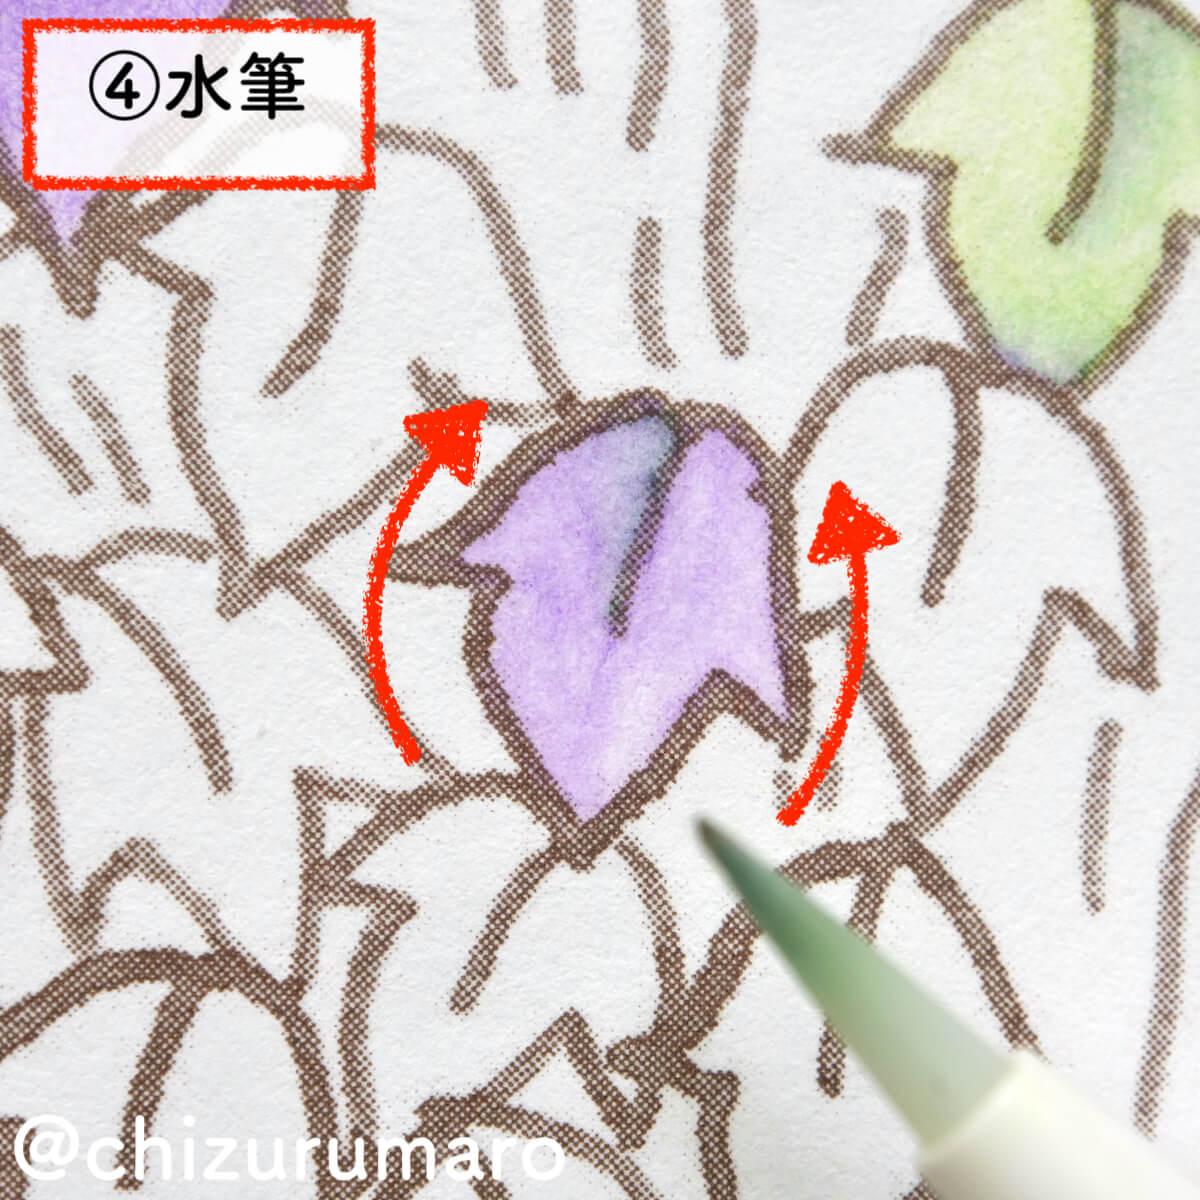 f:id:chizurumaro:20201119165121j:plain